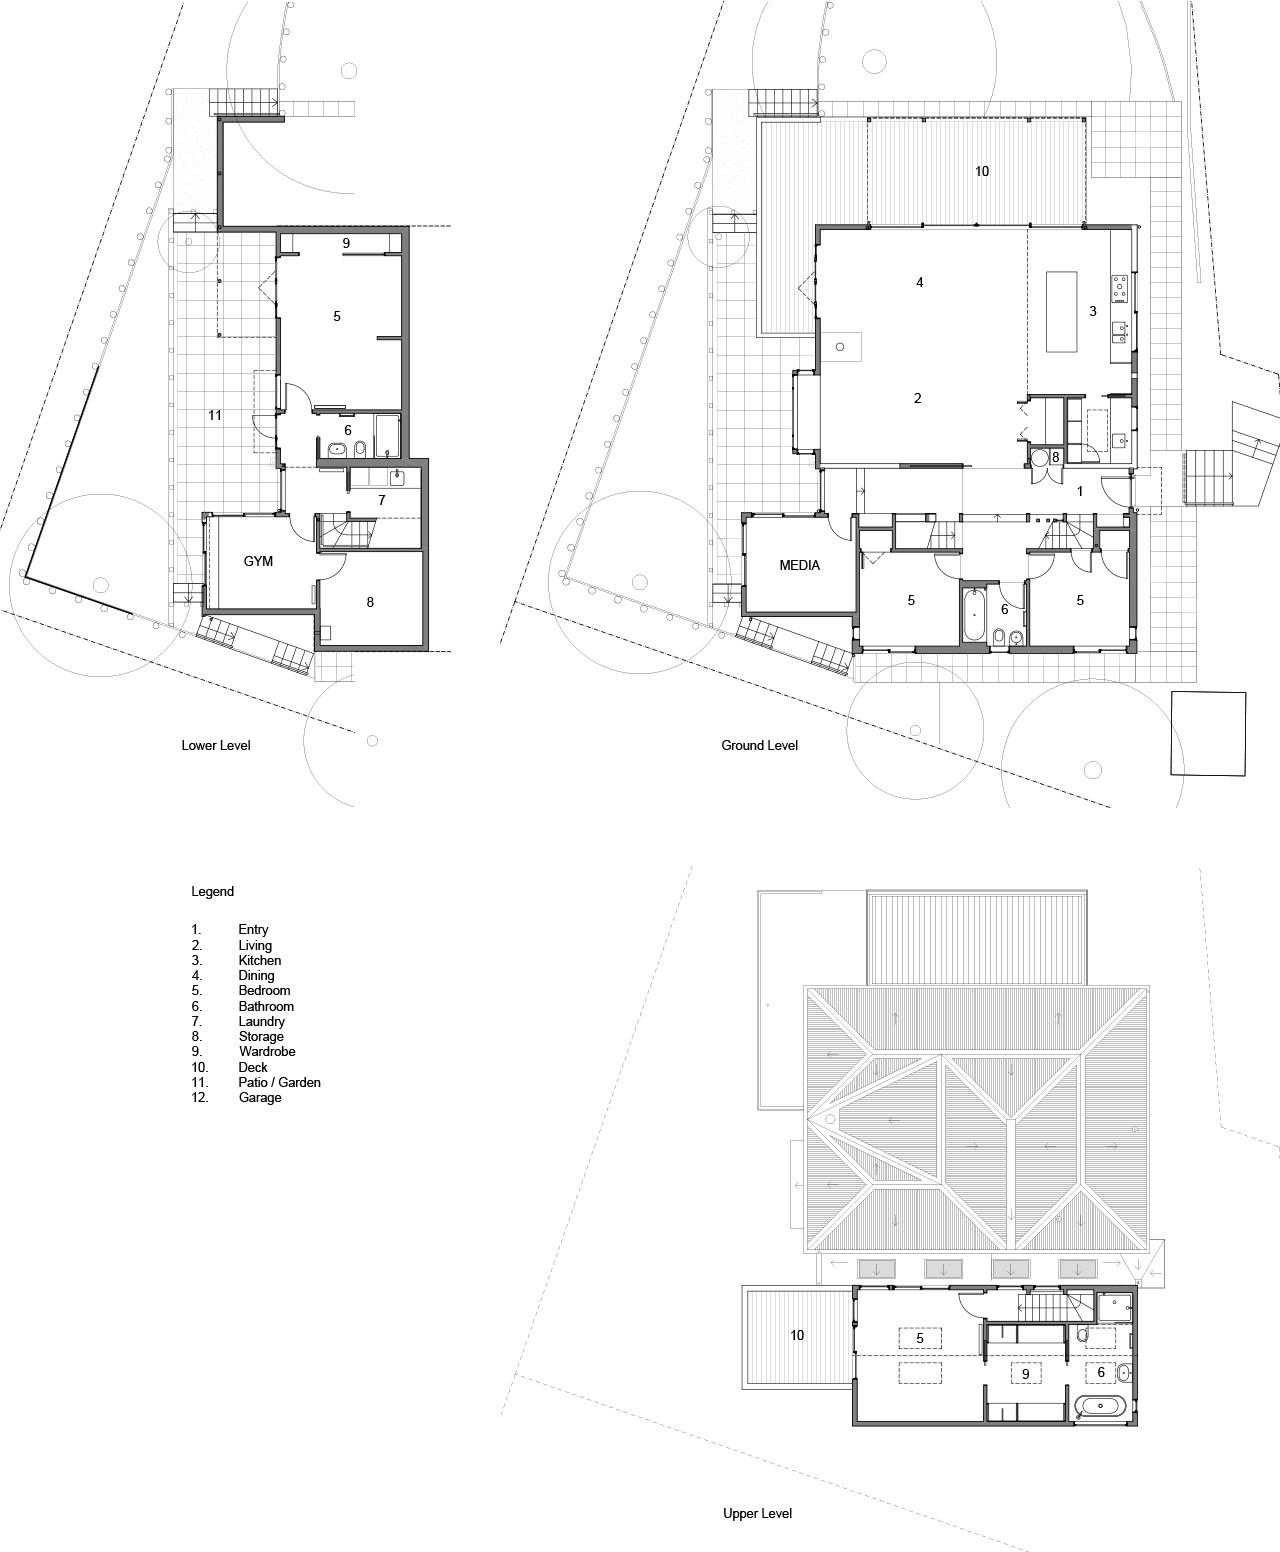 Roseneath - Plansl.jpg